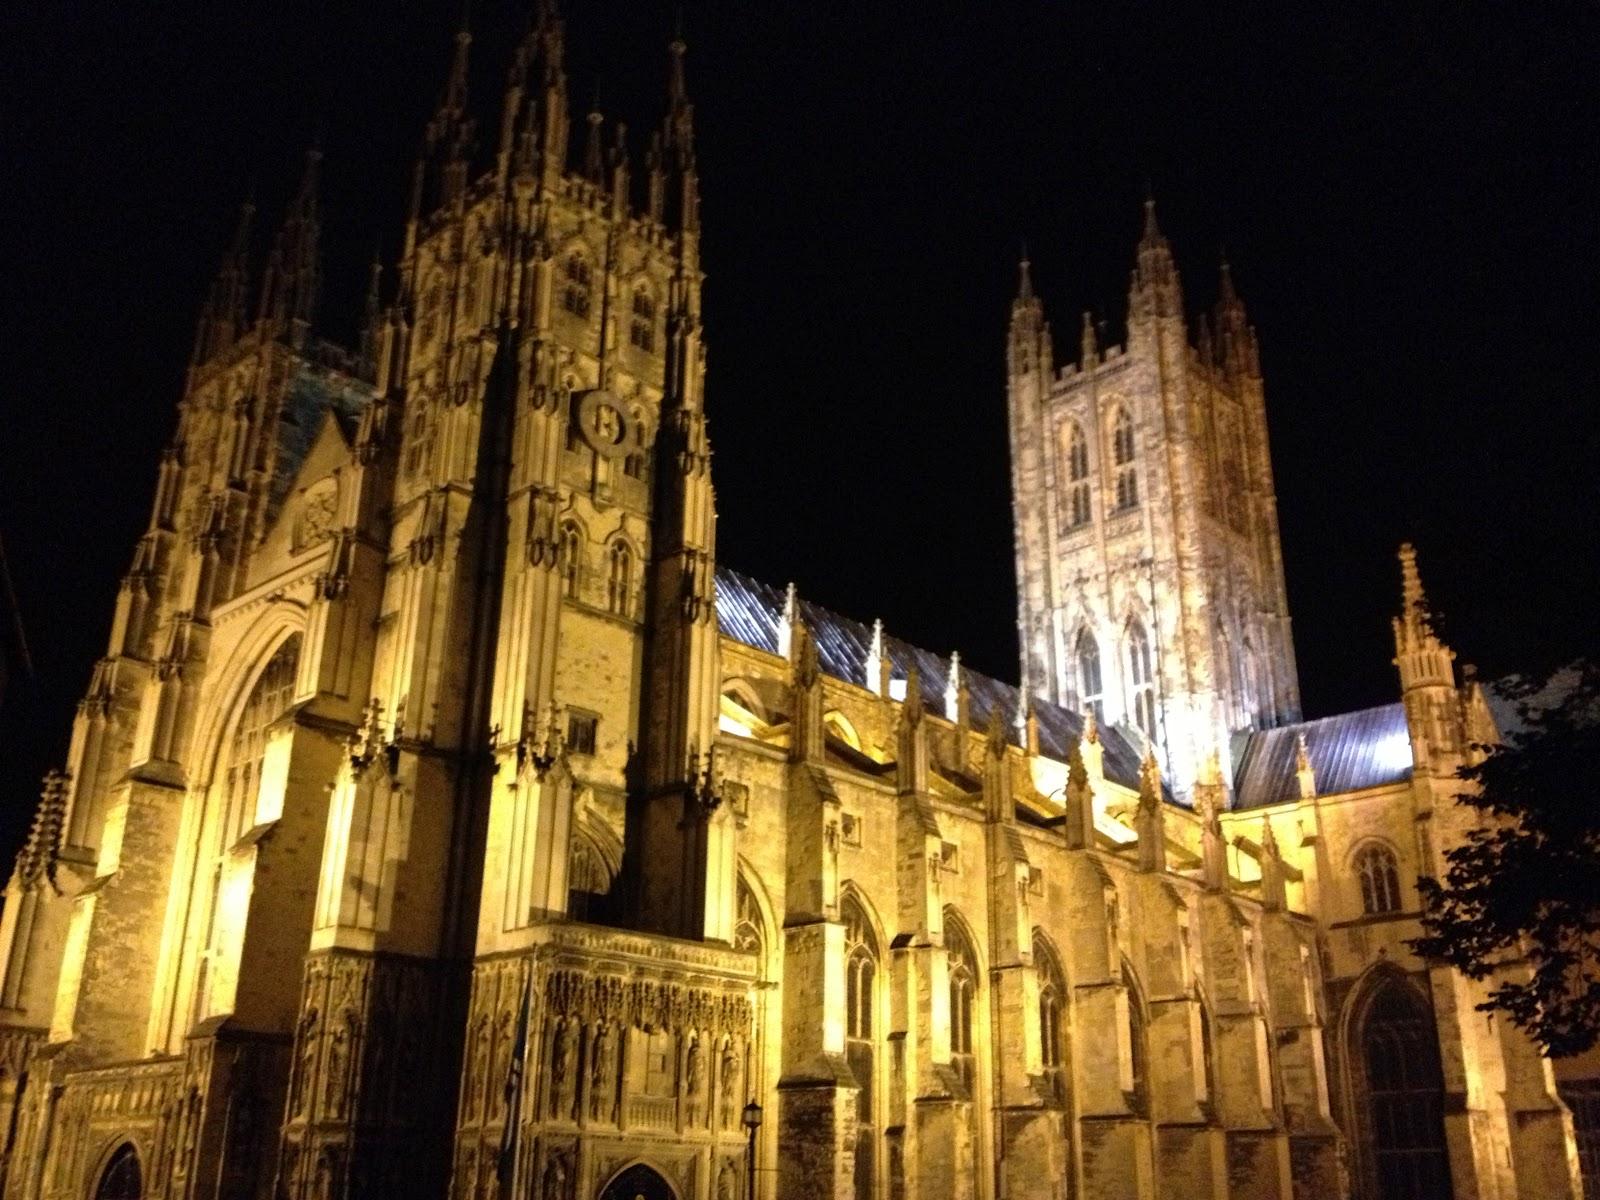 Catedrala Canterbury noaptea